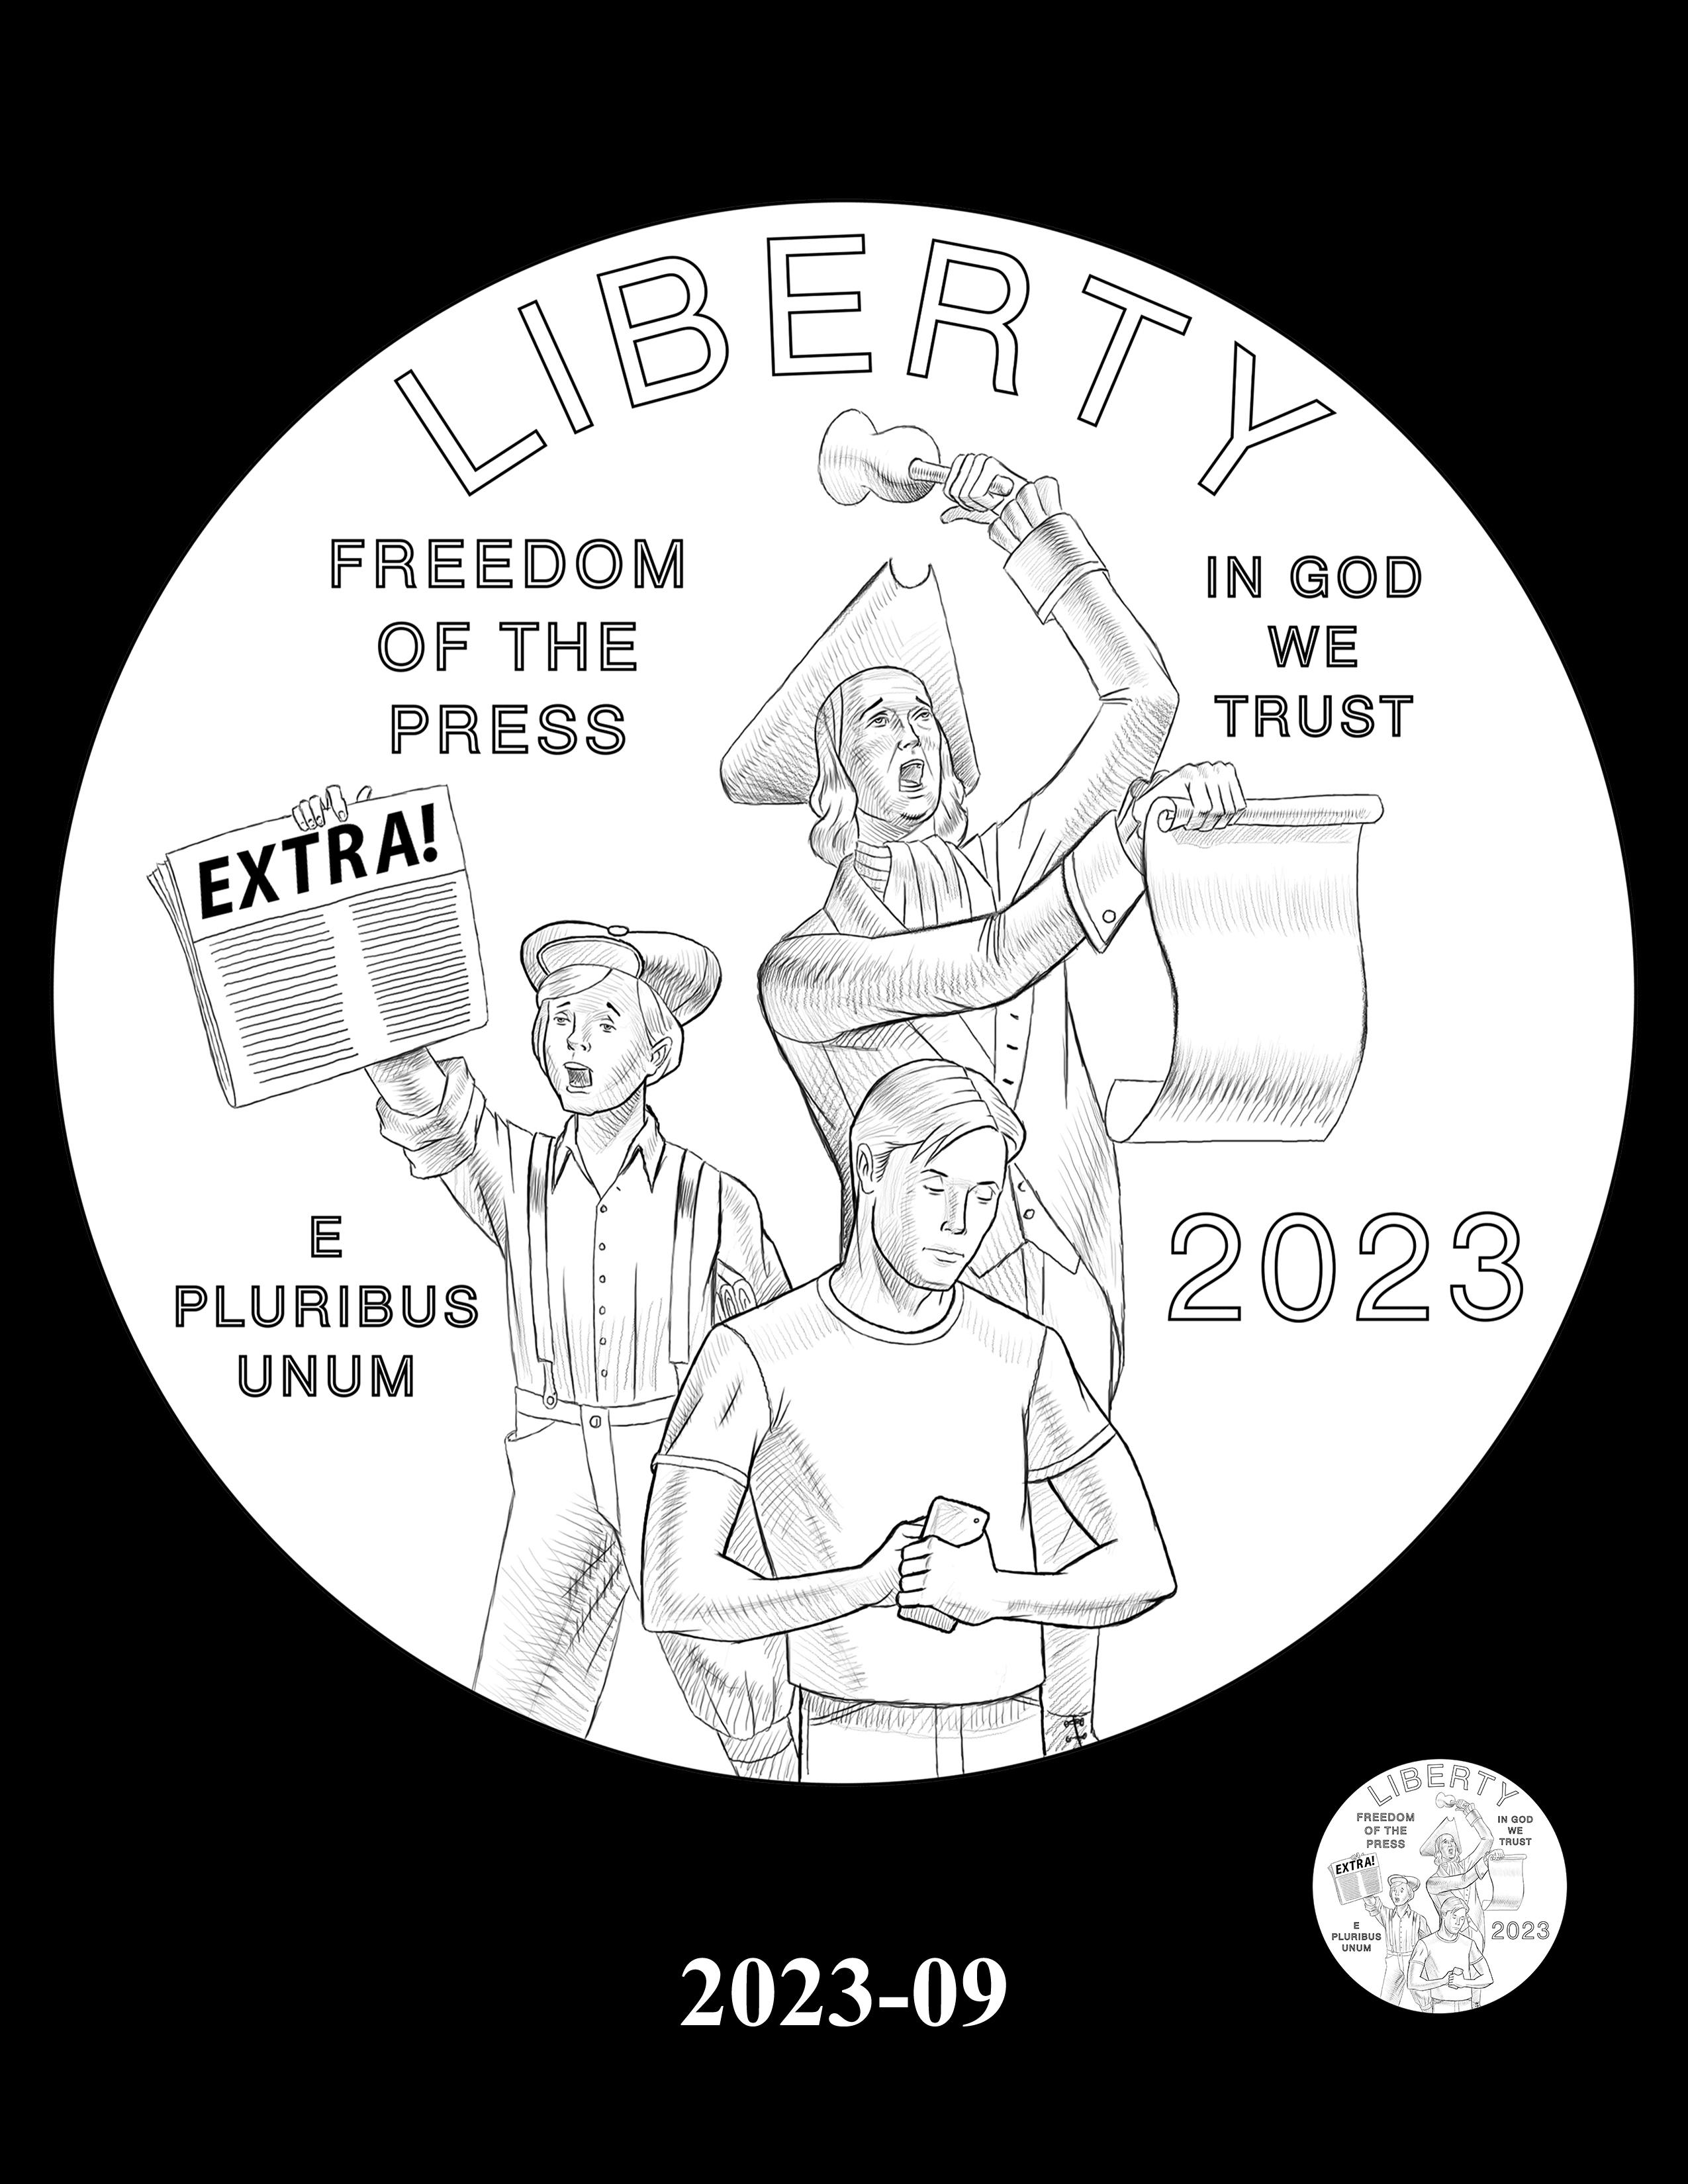 09-2023 -- 2021 - 2025 American Eagle Platinum Proof Program